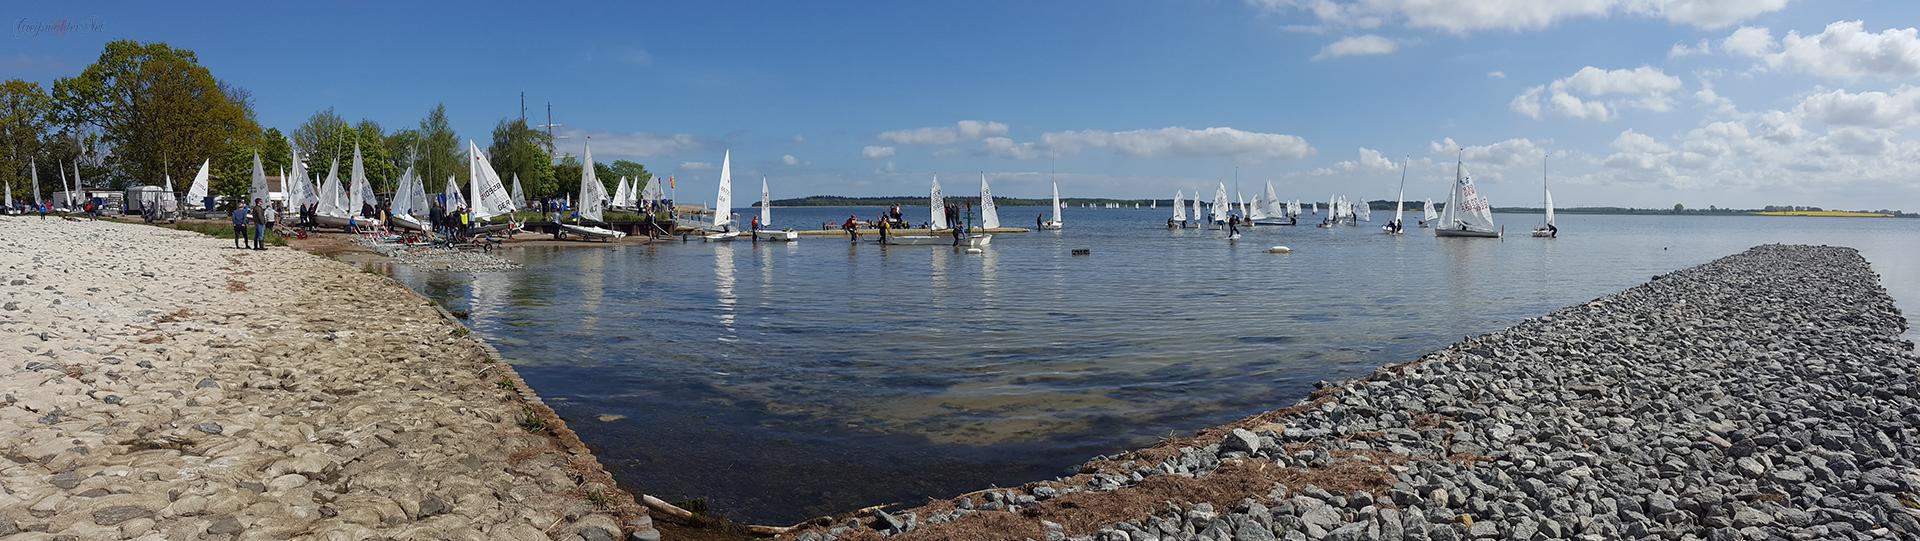 Segelboote (Optimisten-Jolle) in Greifswald-Wieck